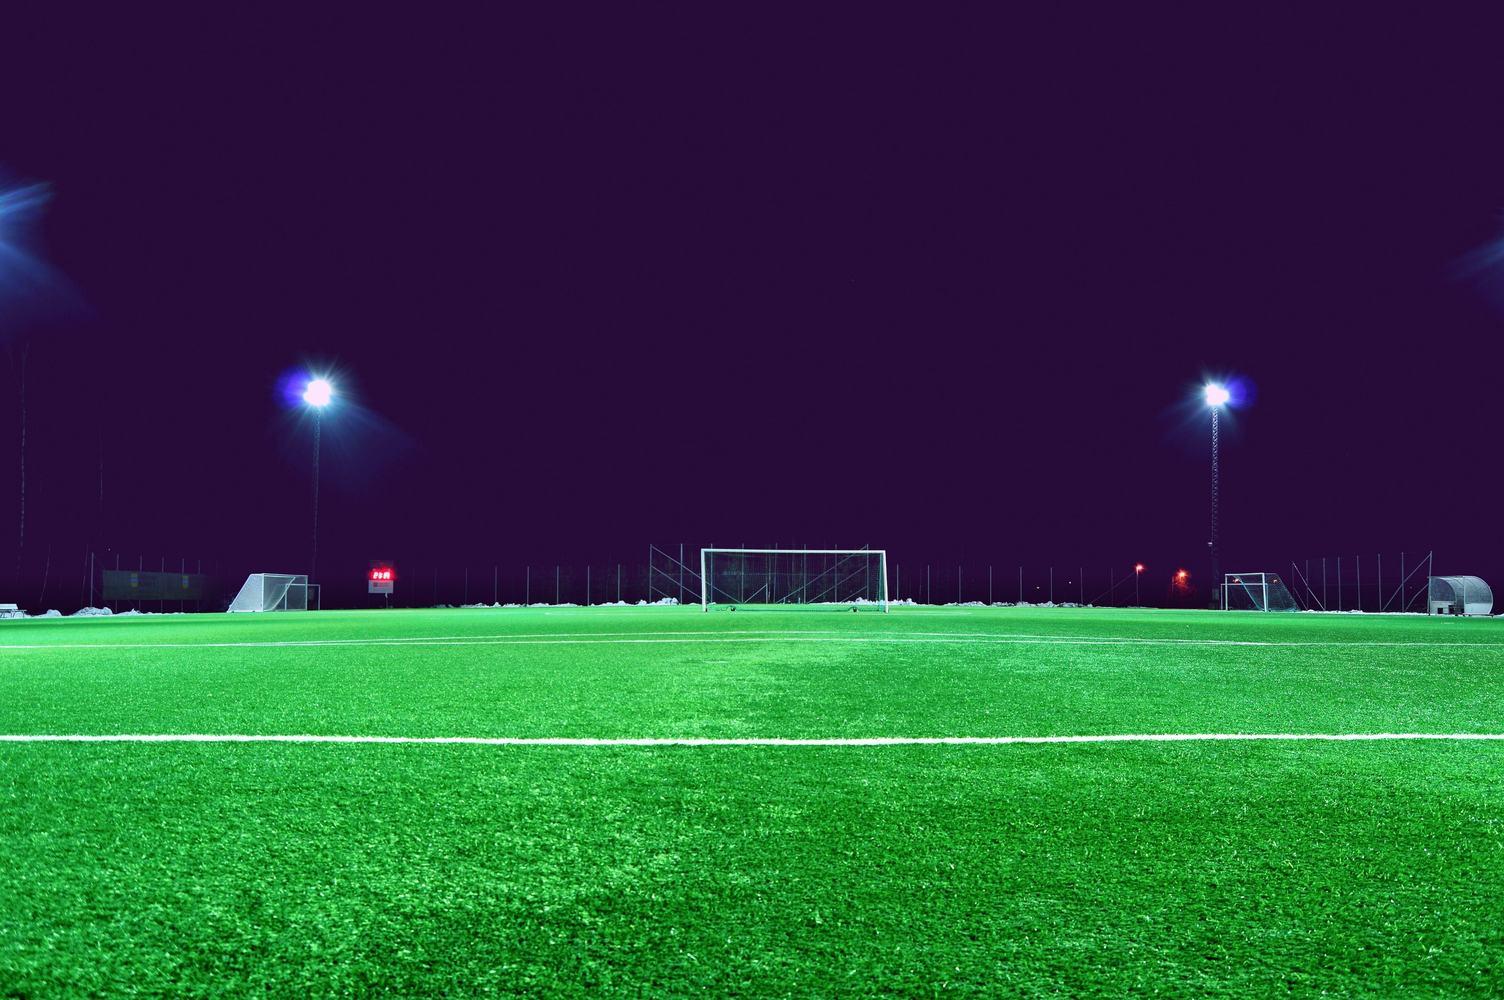 Empty Night Football Field in the Lights